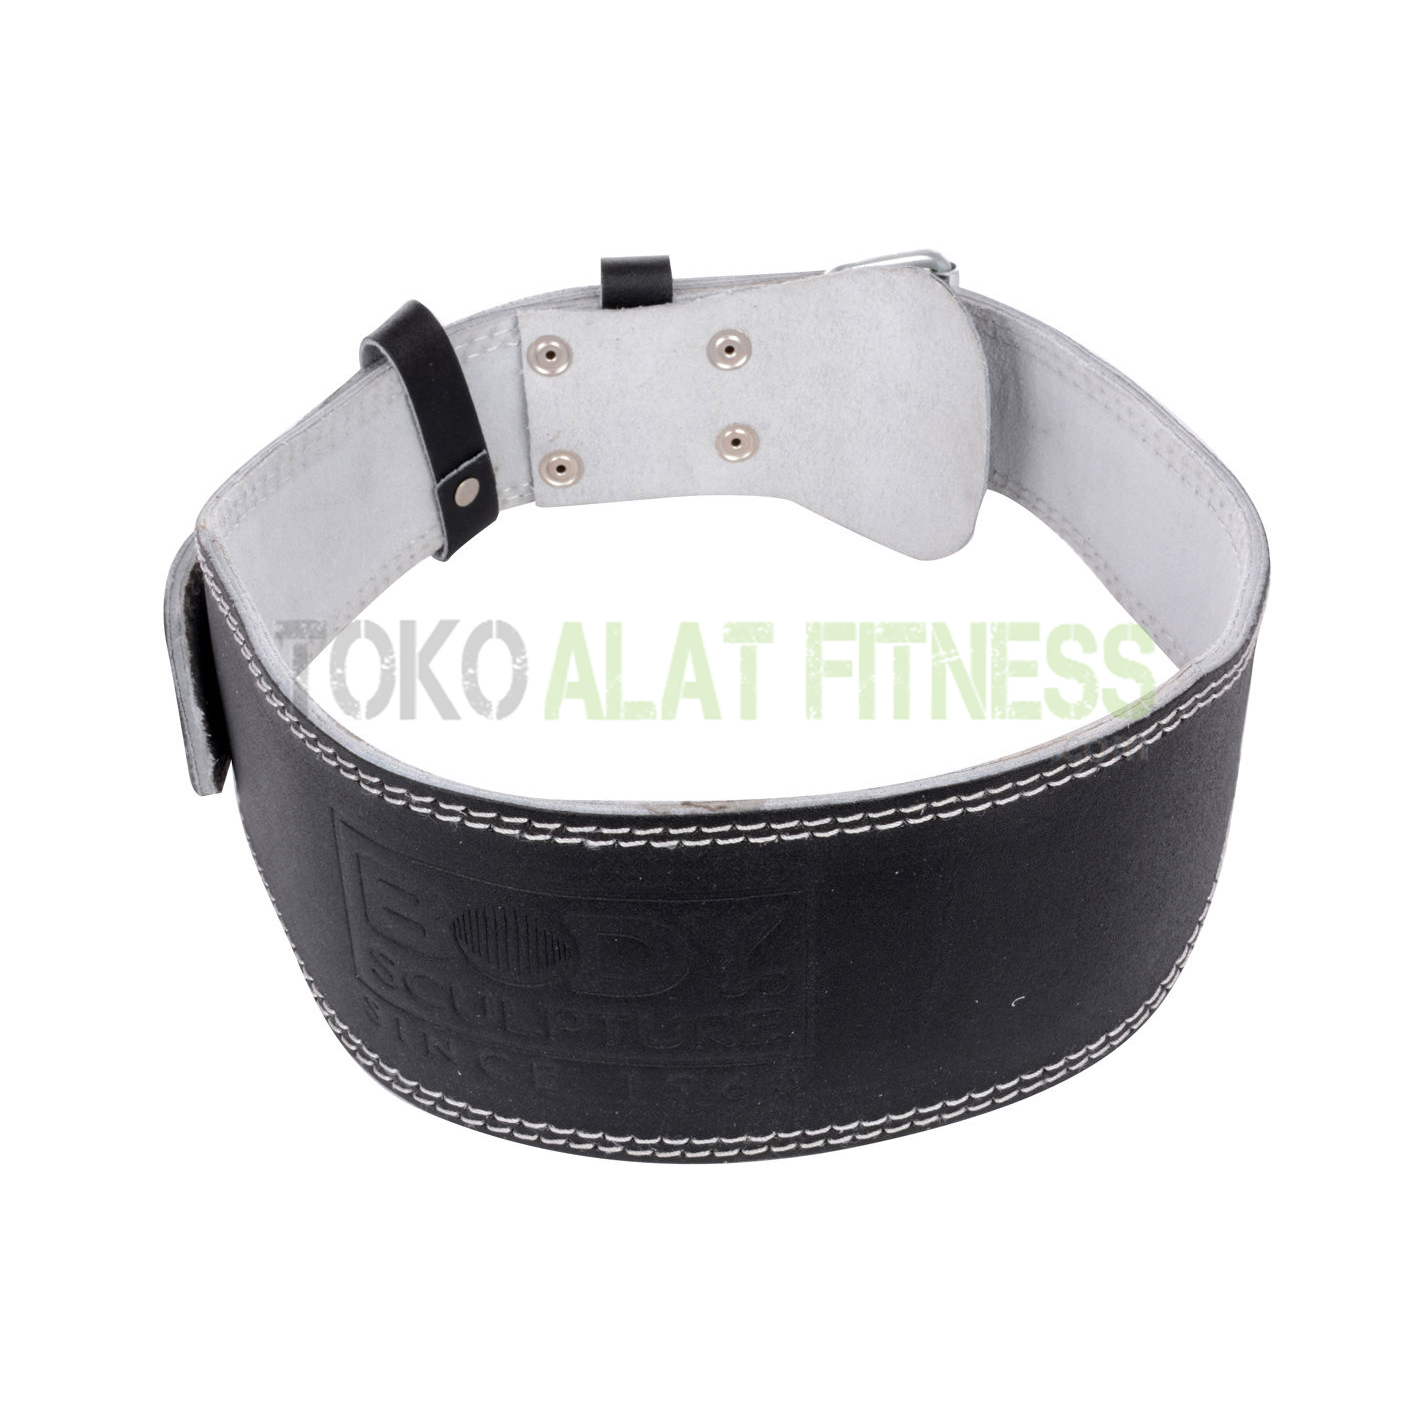 sabuk kulit body sculpture wtr - Sabuk Fitness Kulit (Weight Lifting Belt) L Hitam Body Sculpture - ASSSF1B